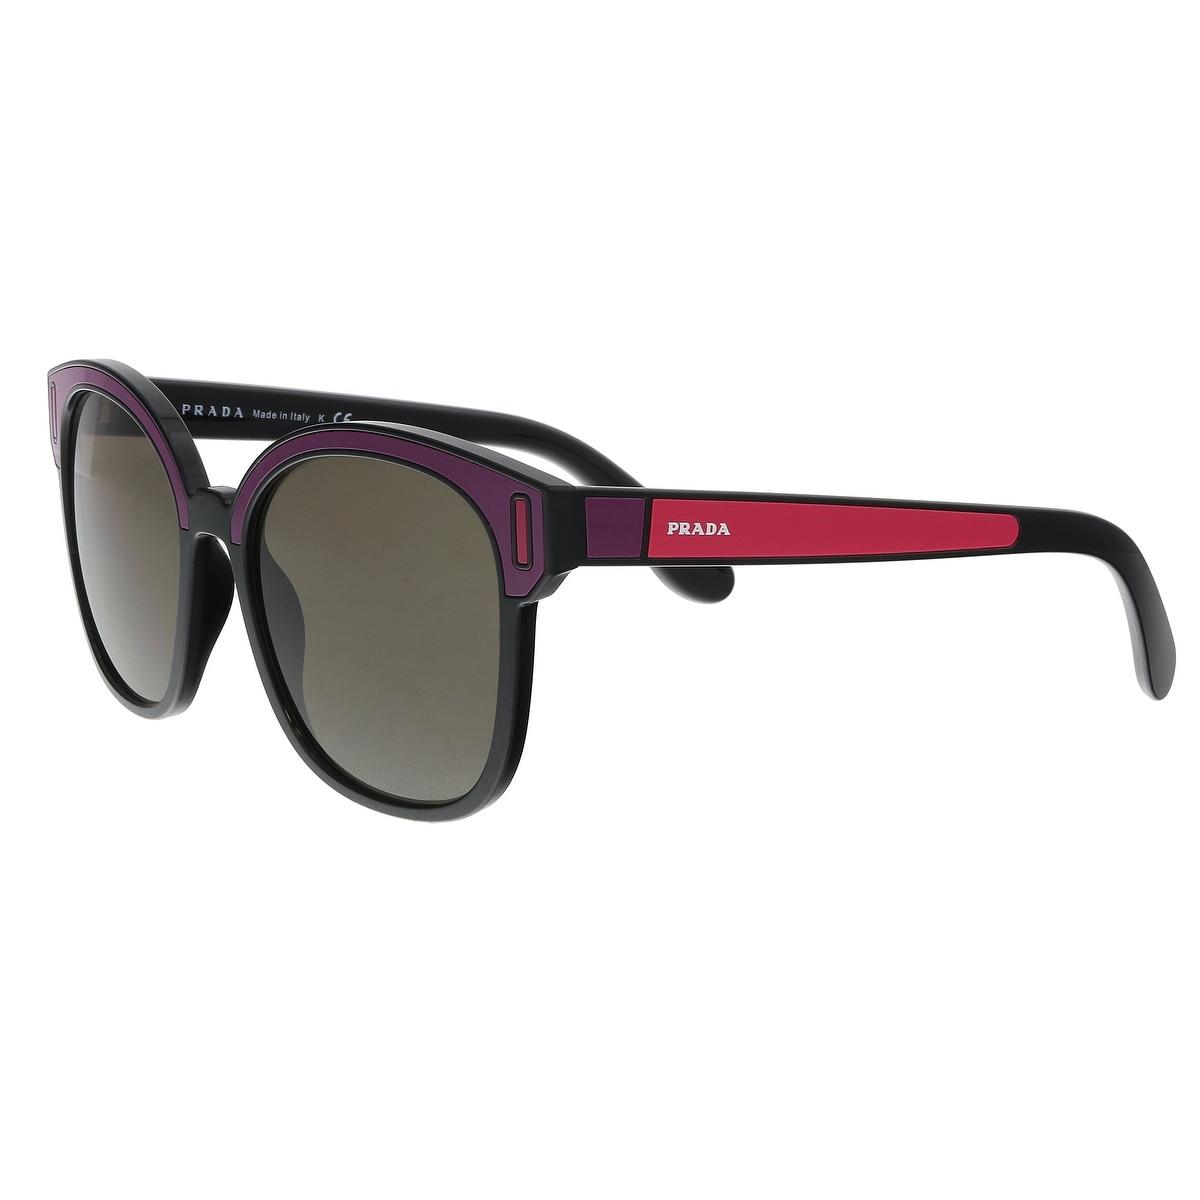 23af10afc5189 Prada Sunglasses